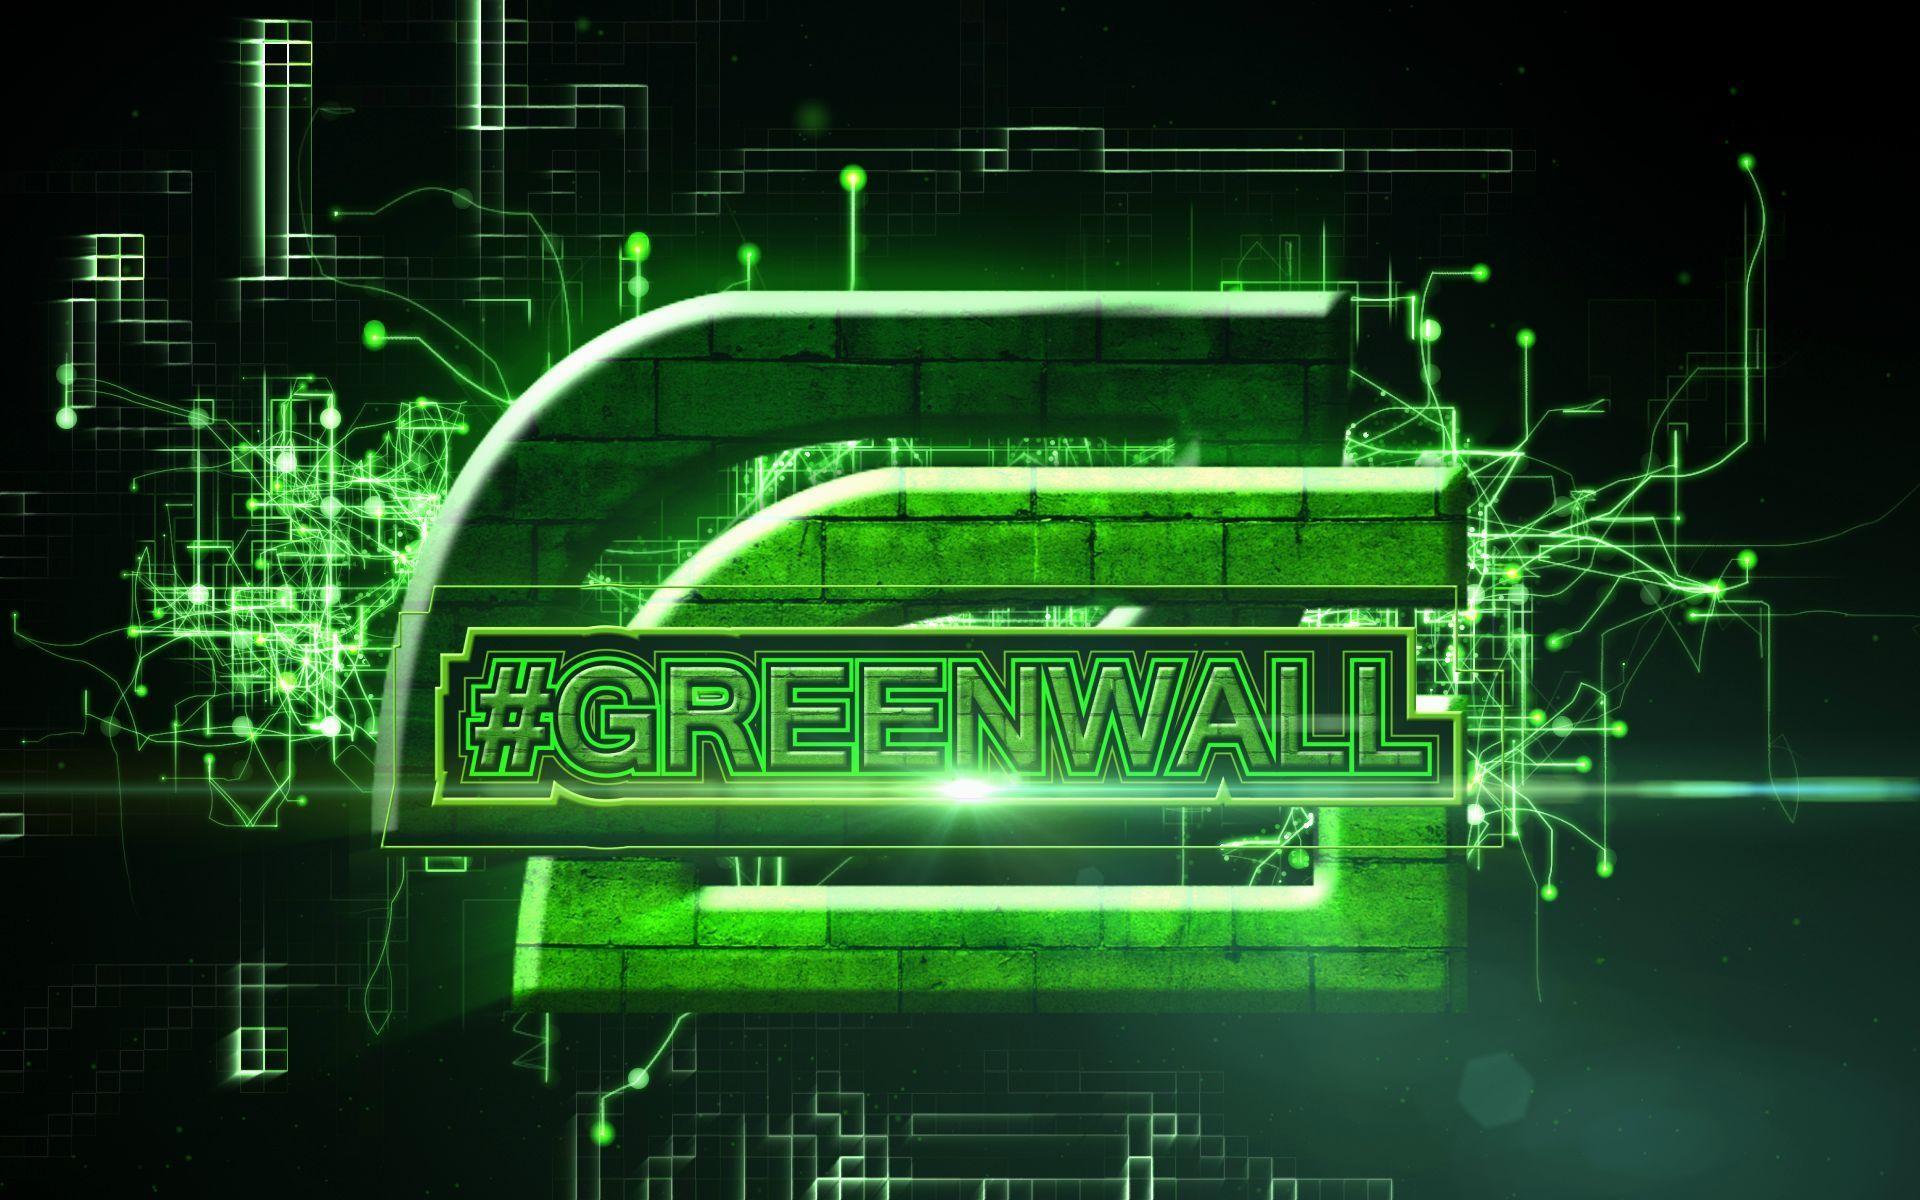 Wallpaper-for-opTic-gaming-organisation-GREENWAL